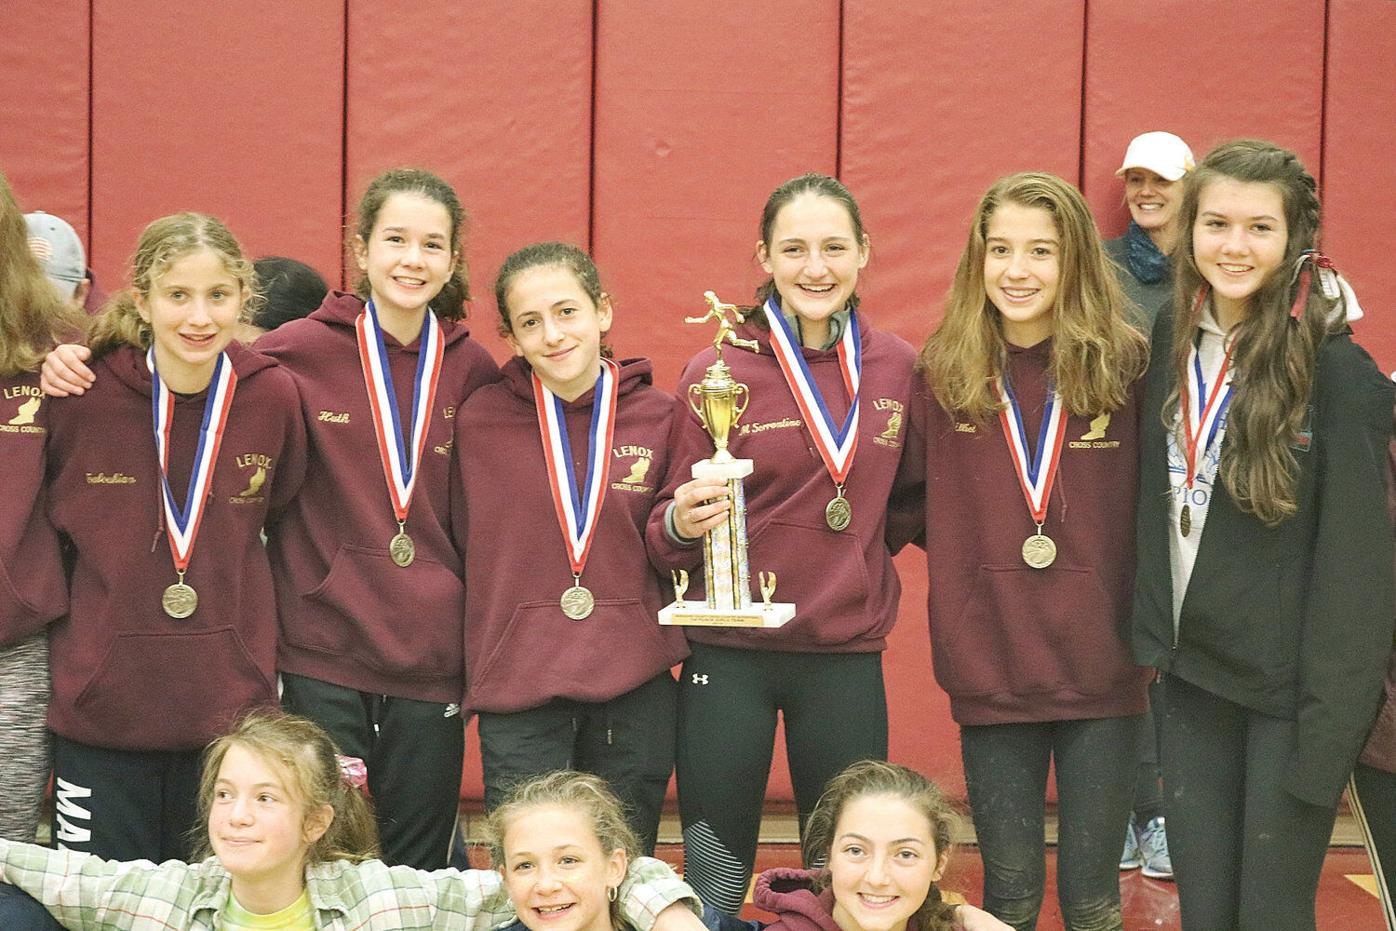 Mount Greylock's Josie Smith, Jesse Seid race to wins at Berkshire County Individuals; Greylock boys, Lenox girls claim team titles